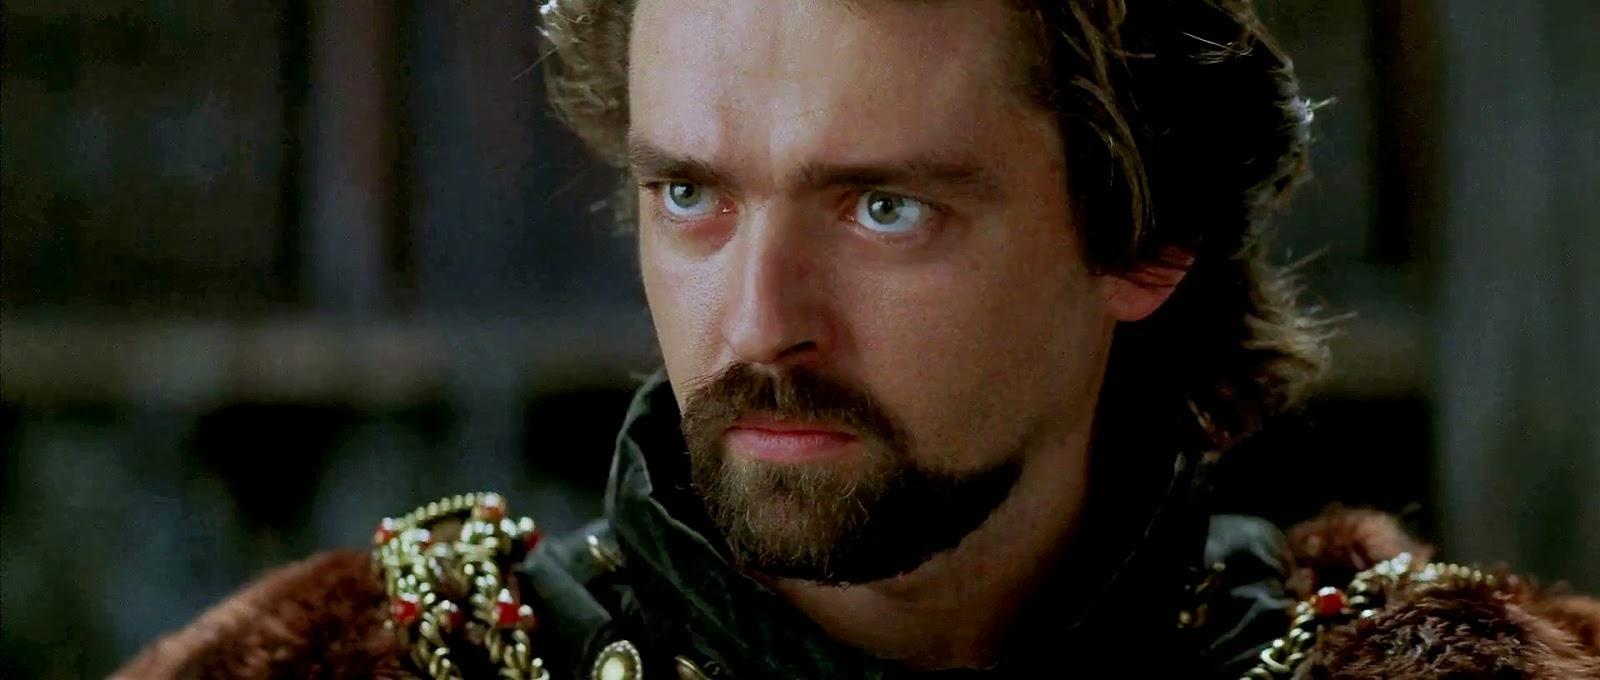 Braveheart (1995) S4 s Braveheart (1995)